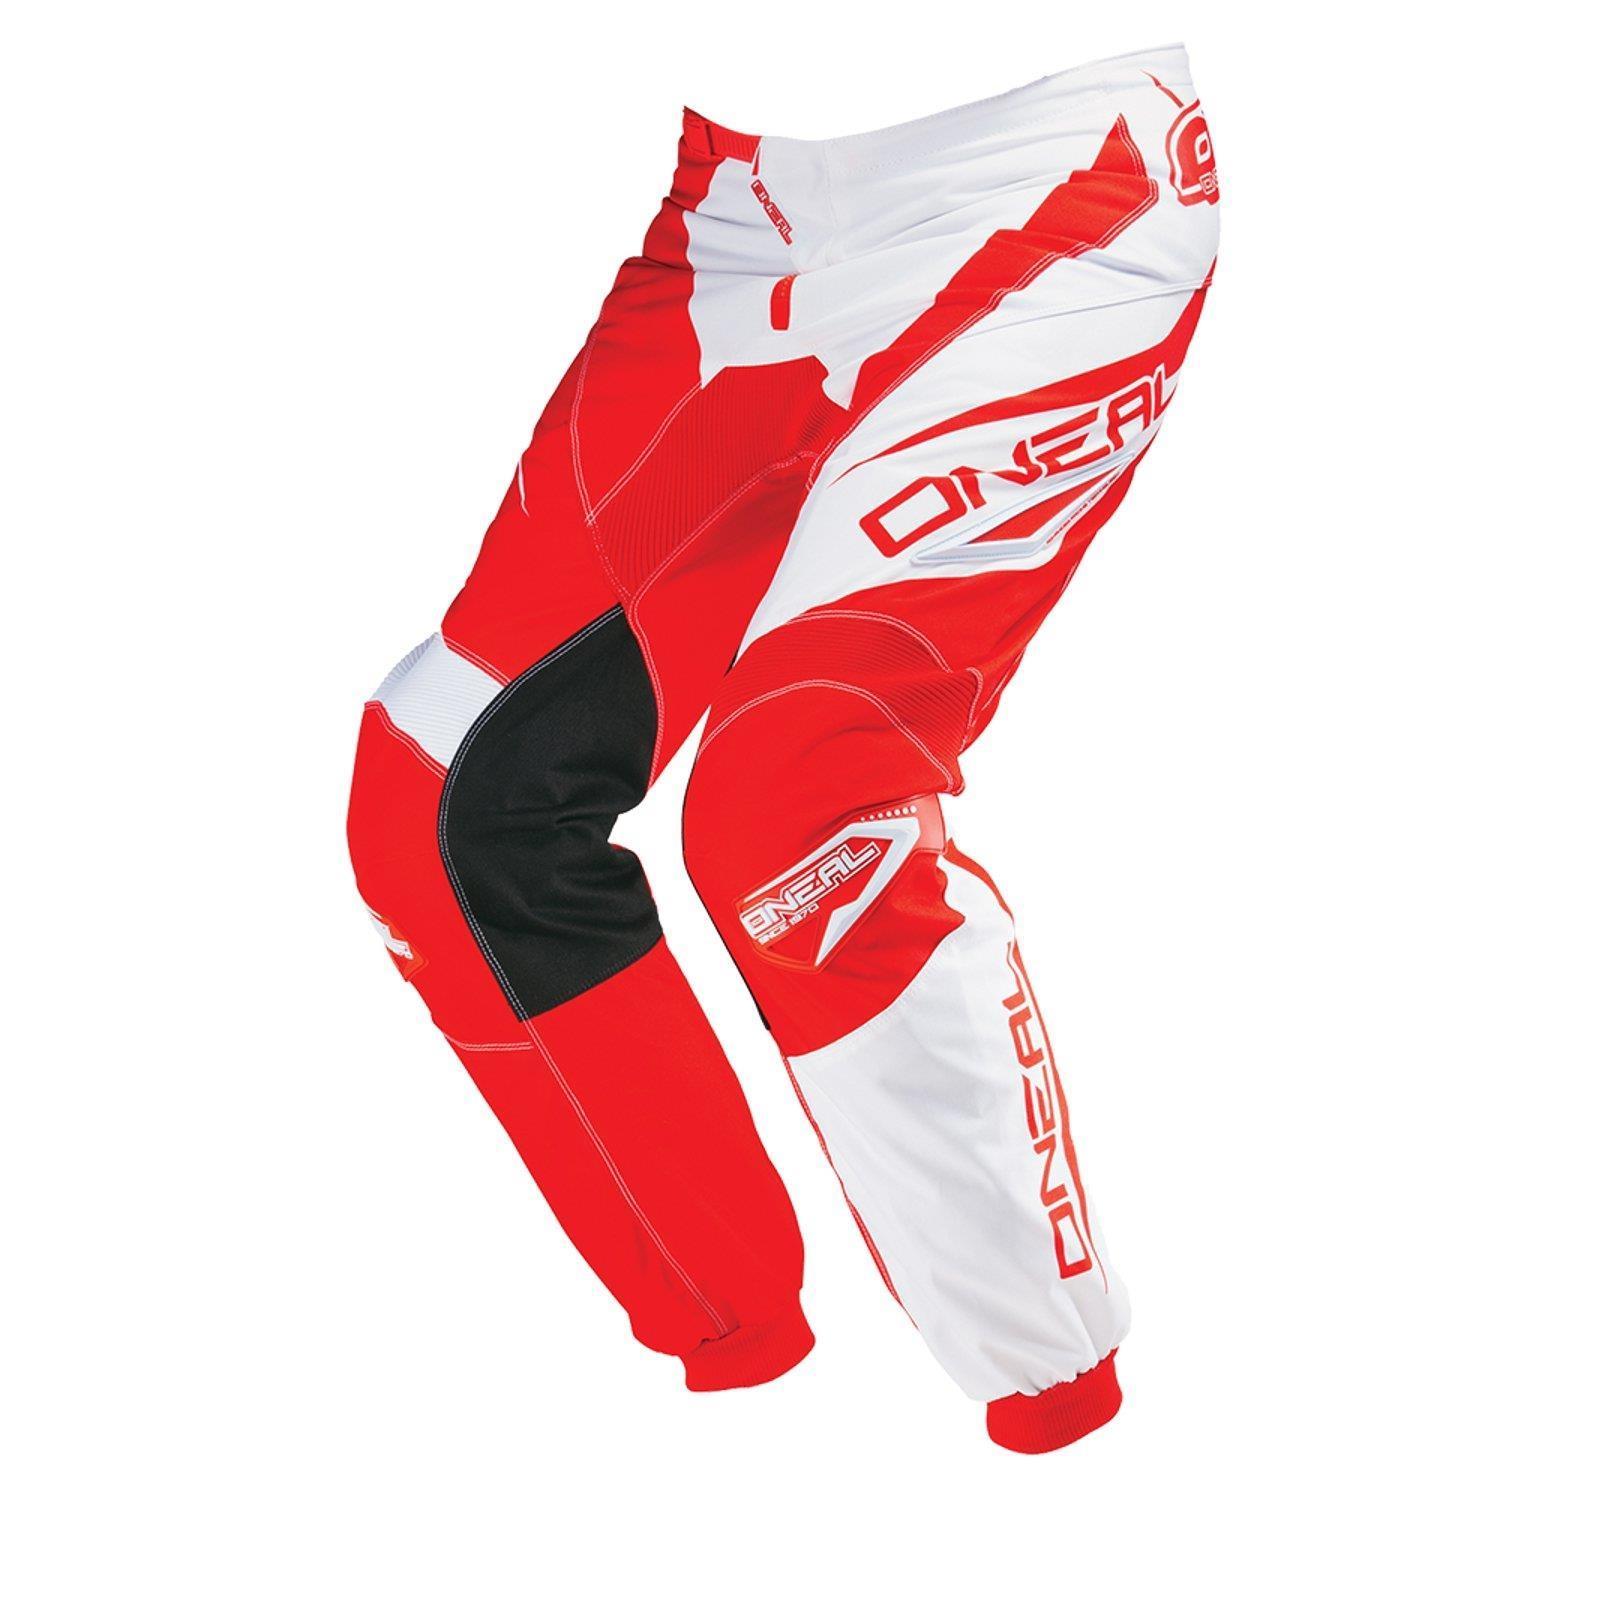 O-039-neal-elemento-Mayhem-Hardwear-Pants-pantalones-MX-Moto-Cross-Enduro-todoterreno-cuero miniatura 17